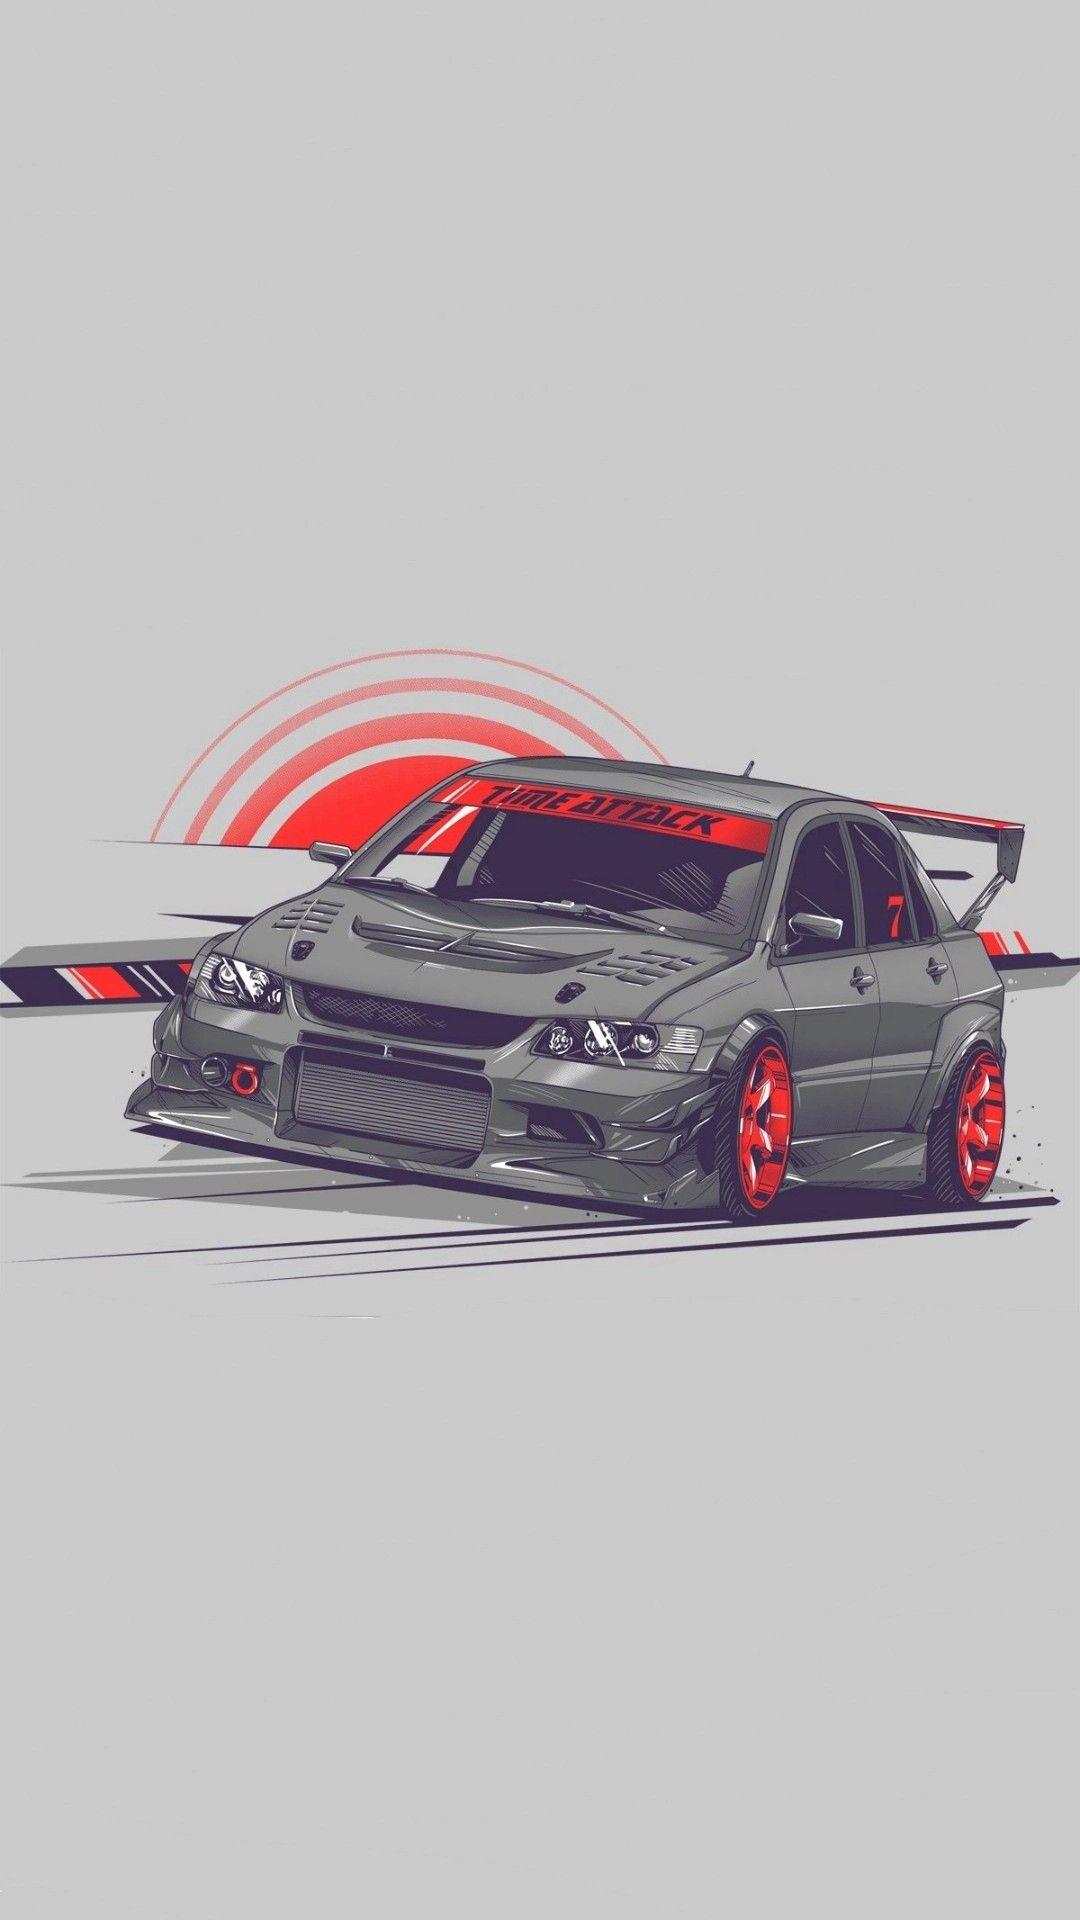 Pin By Saintninja On Cartoon Jdm Car Car Wallpapers Art Cars Tuner Cars